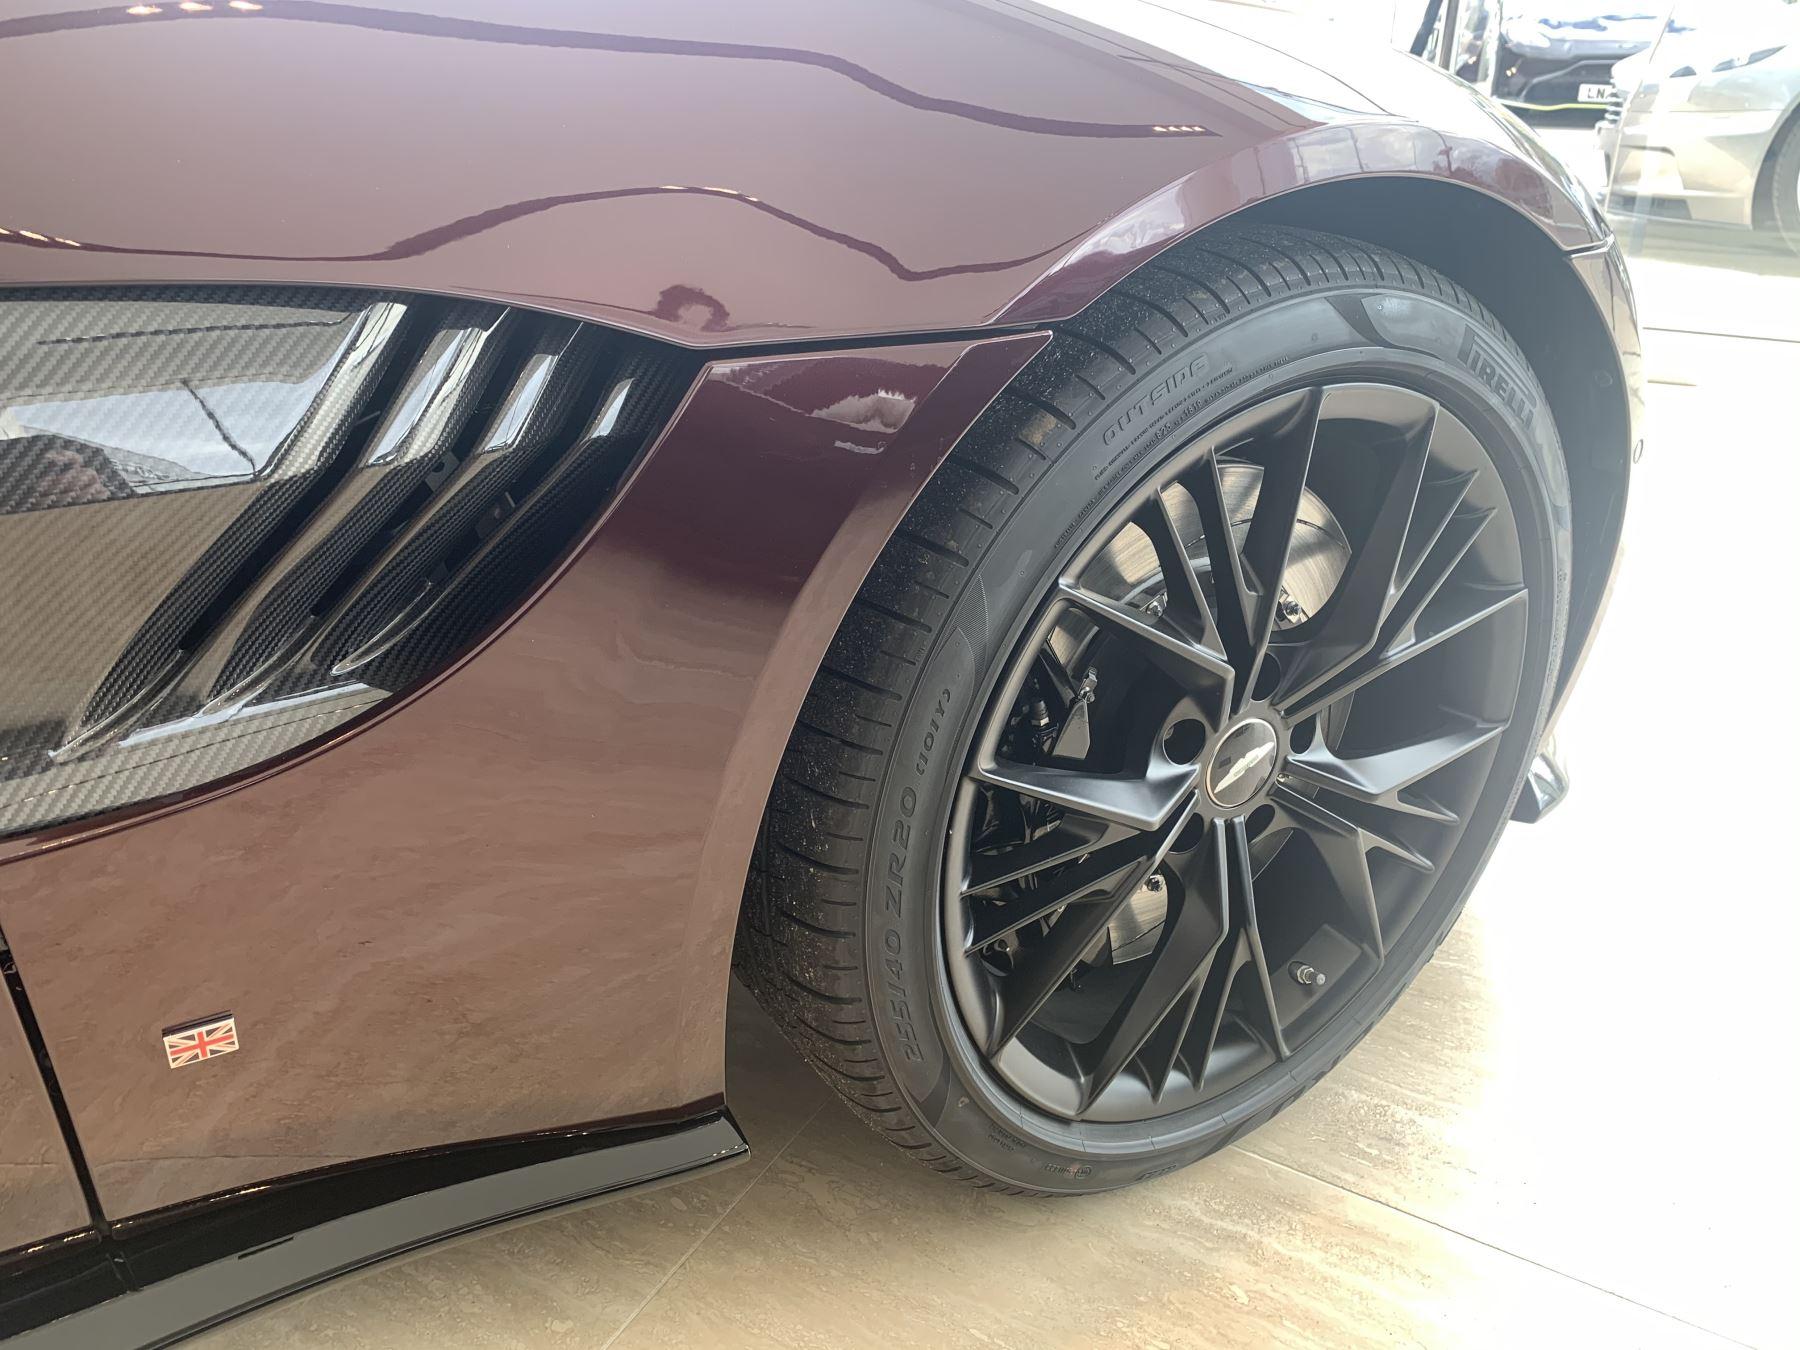 Aston Martin V8 Vantage Convertible Touchtronic 3 image 3